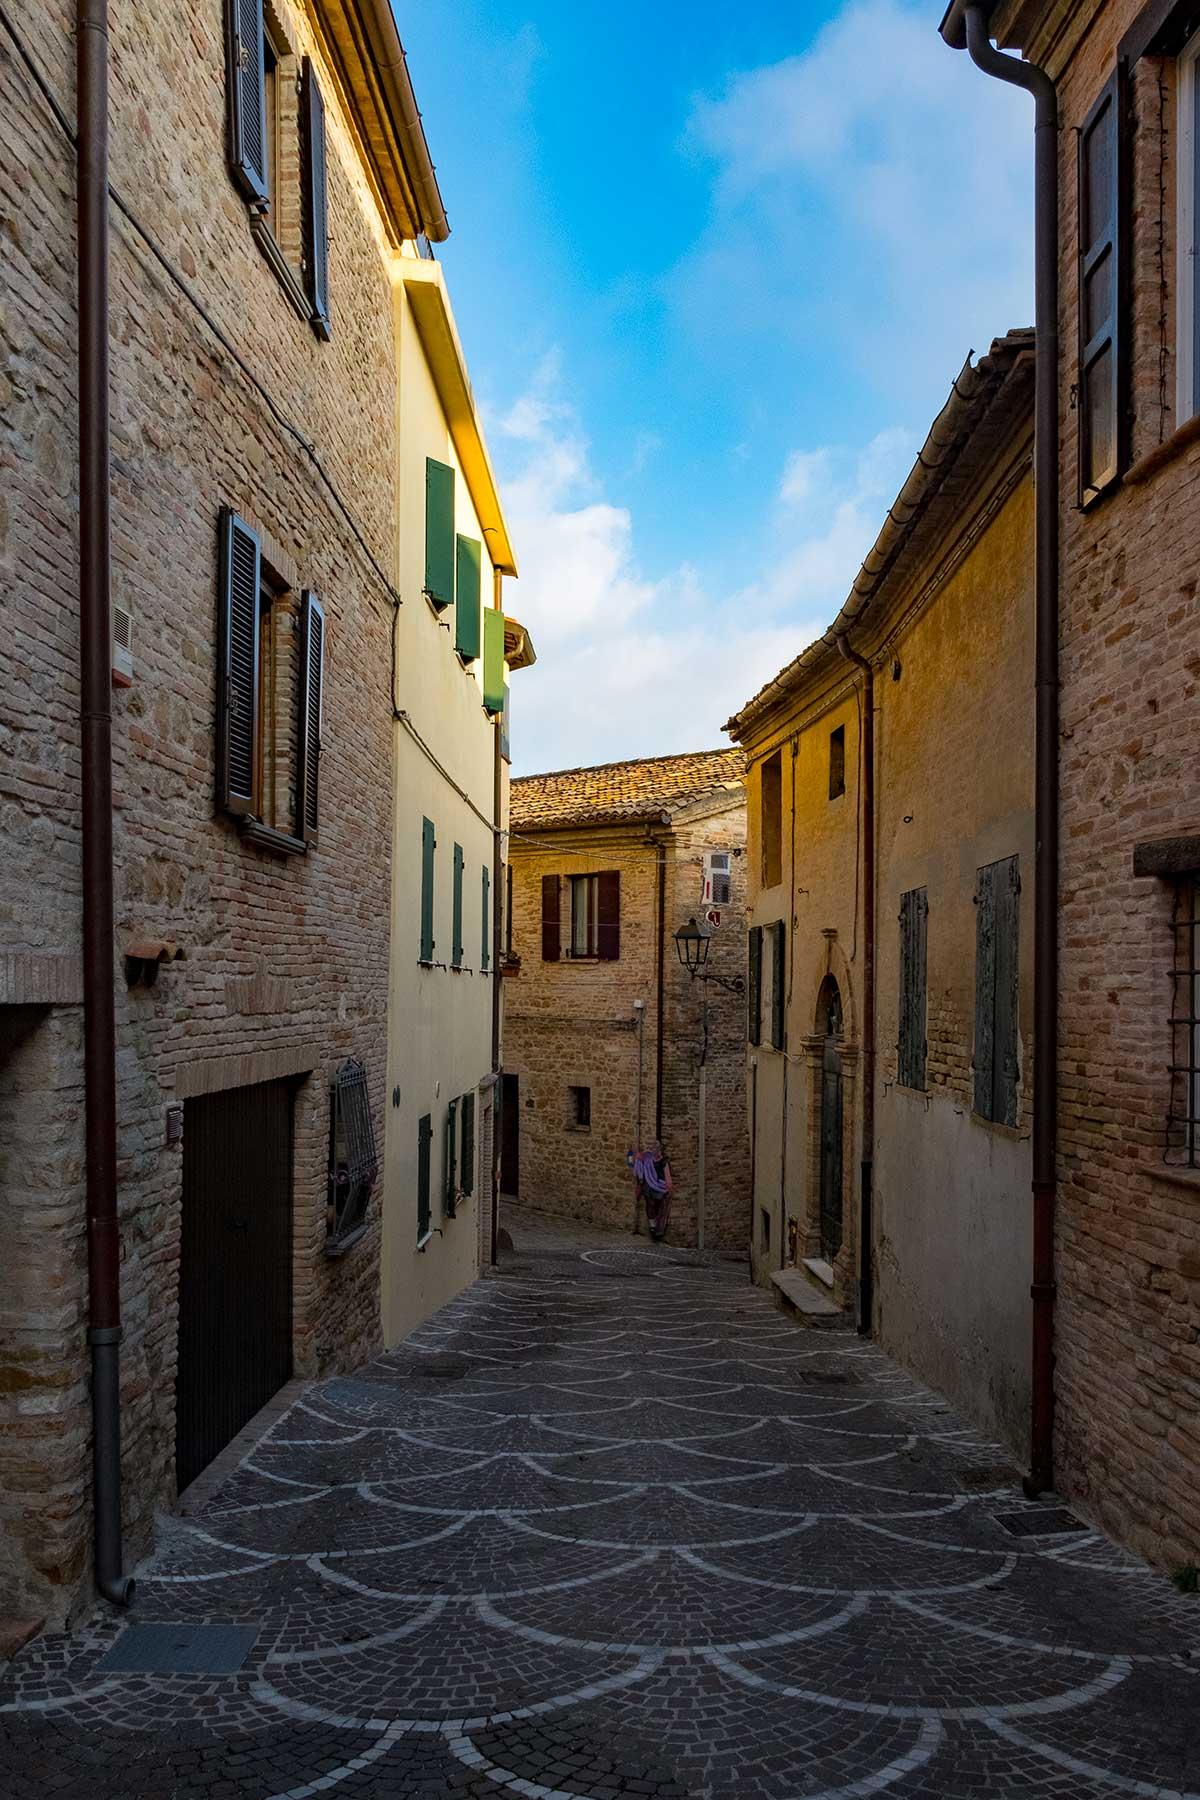 Borgo Fiorenzuola di Focara